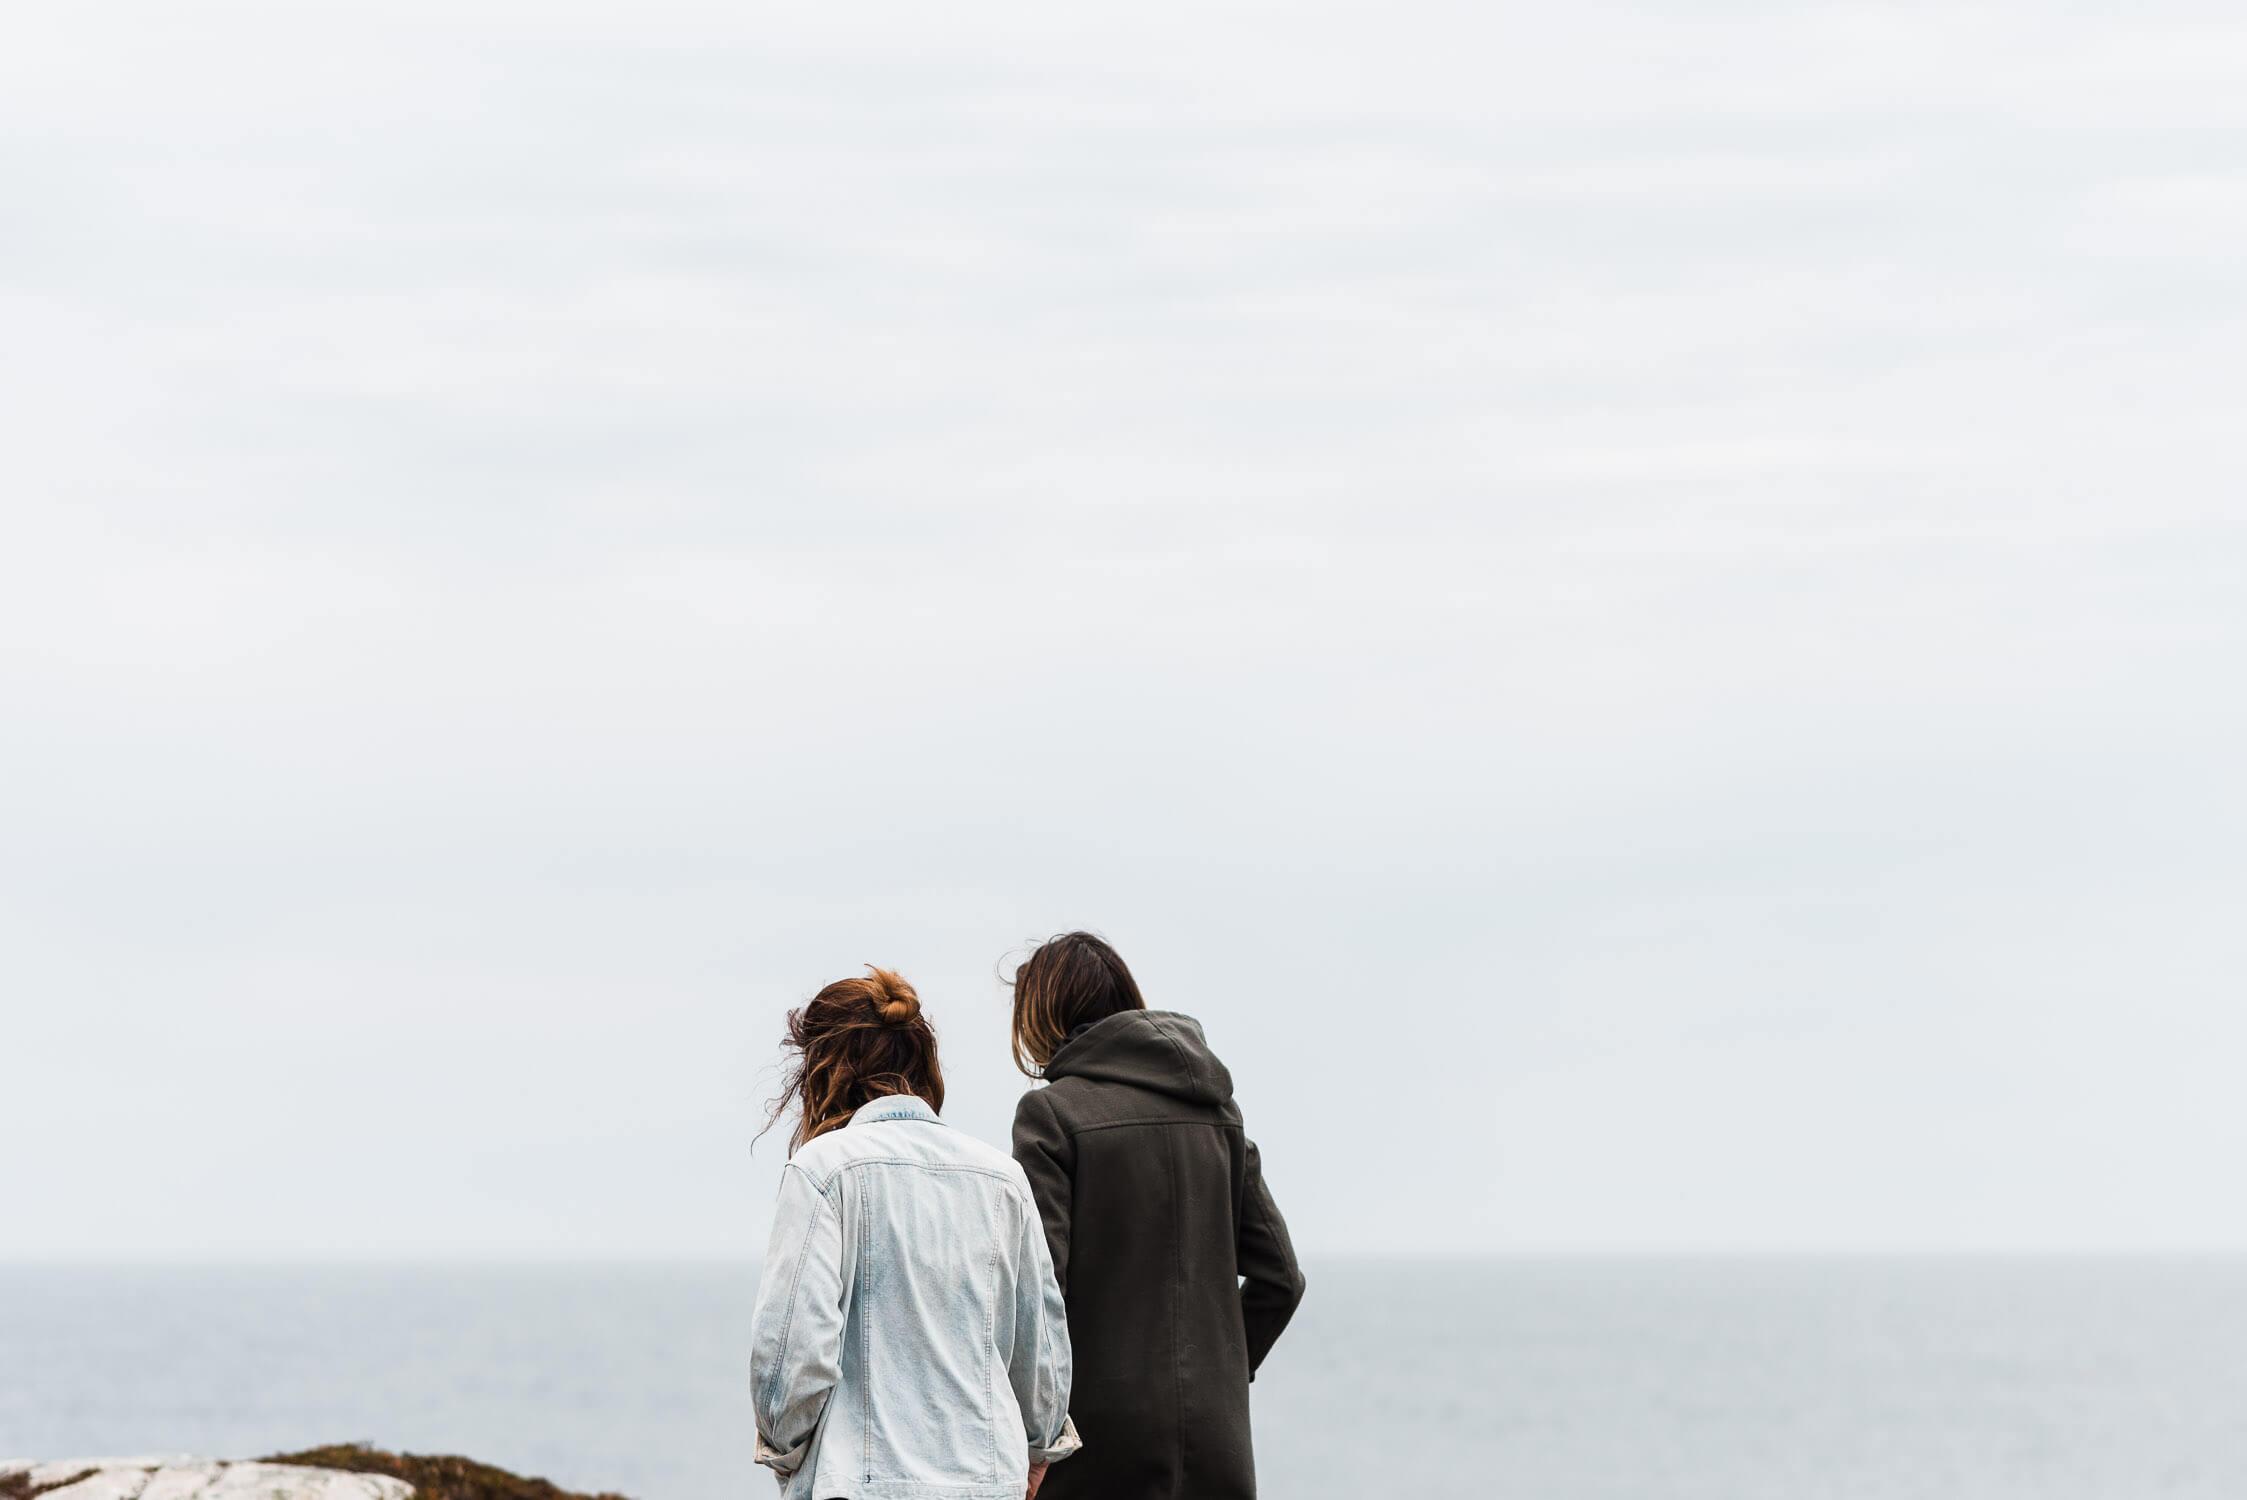 Two girls walking away towards the ocean